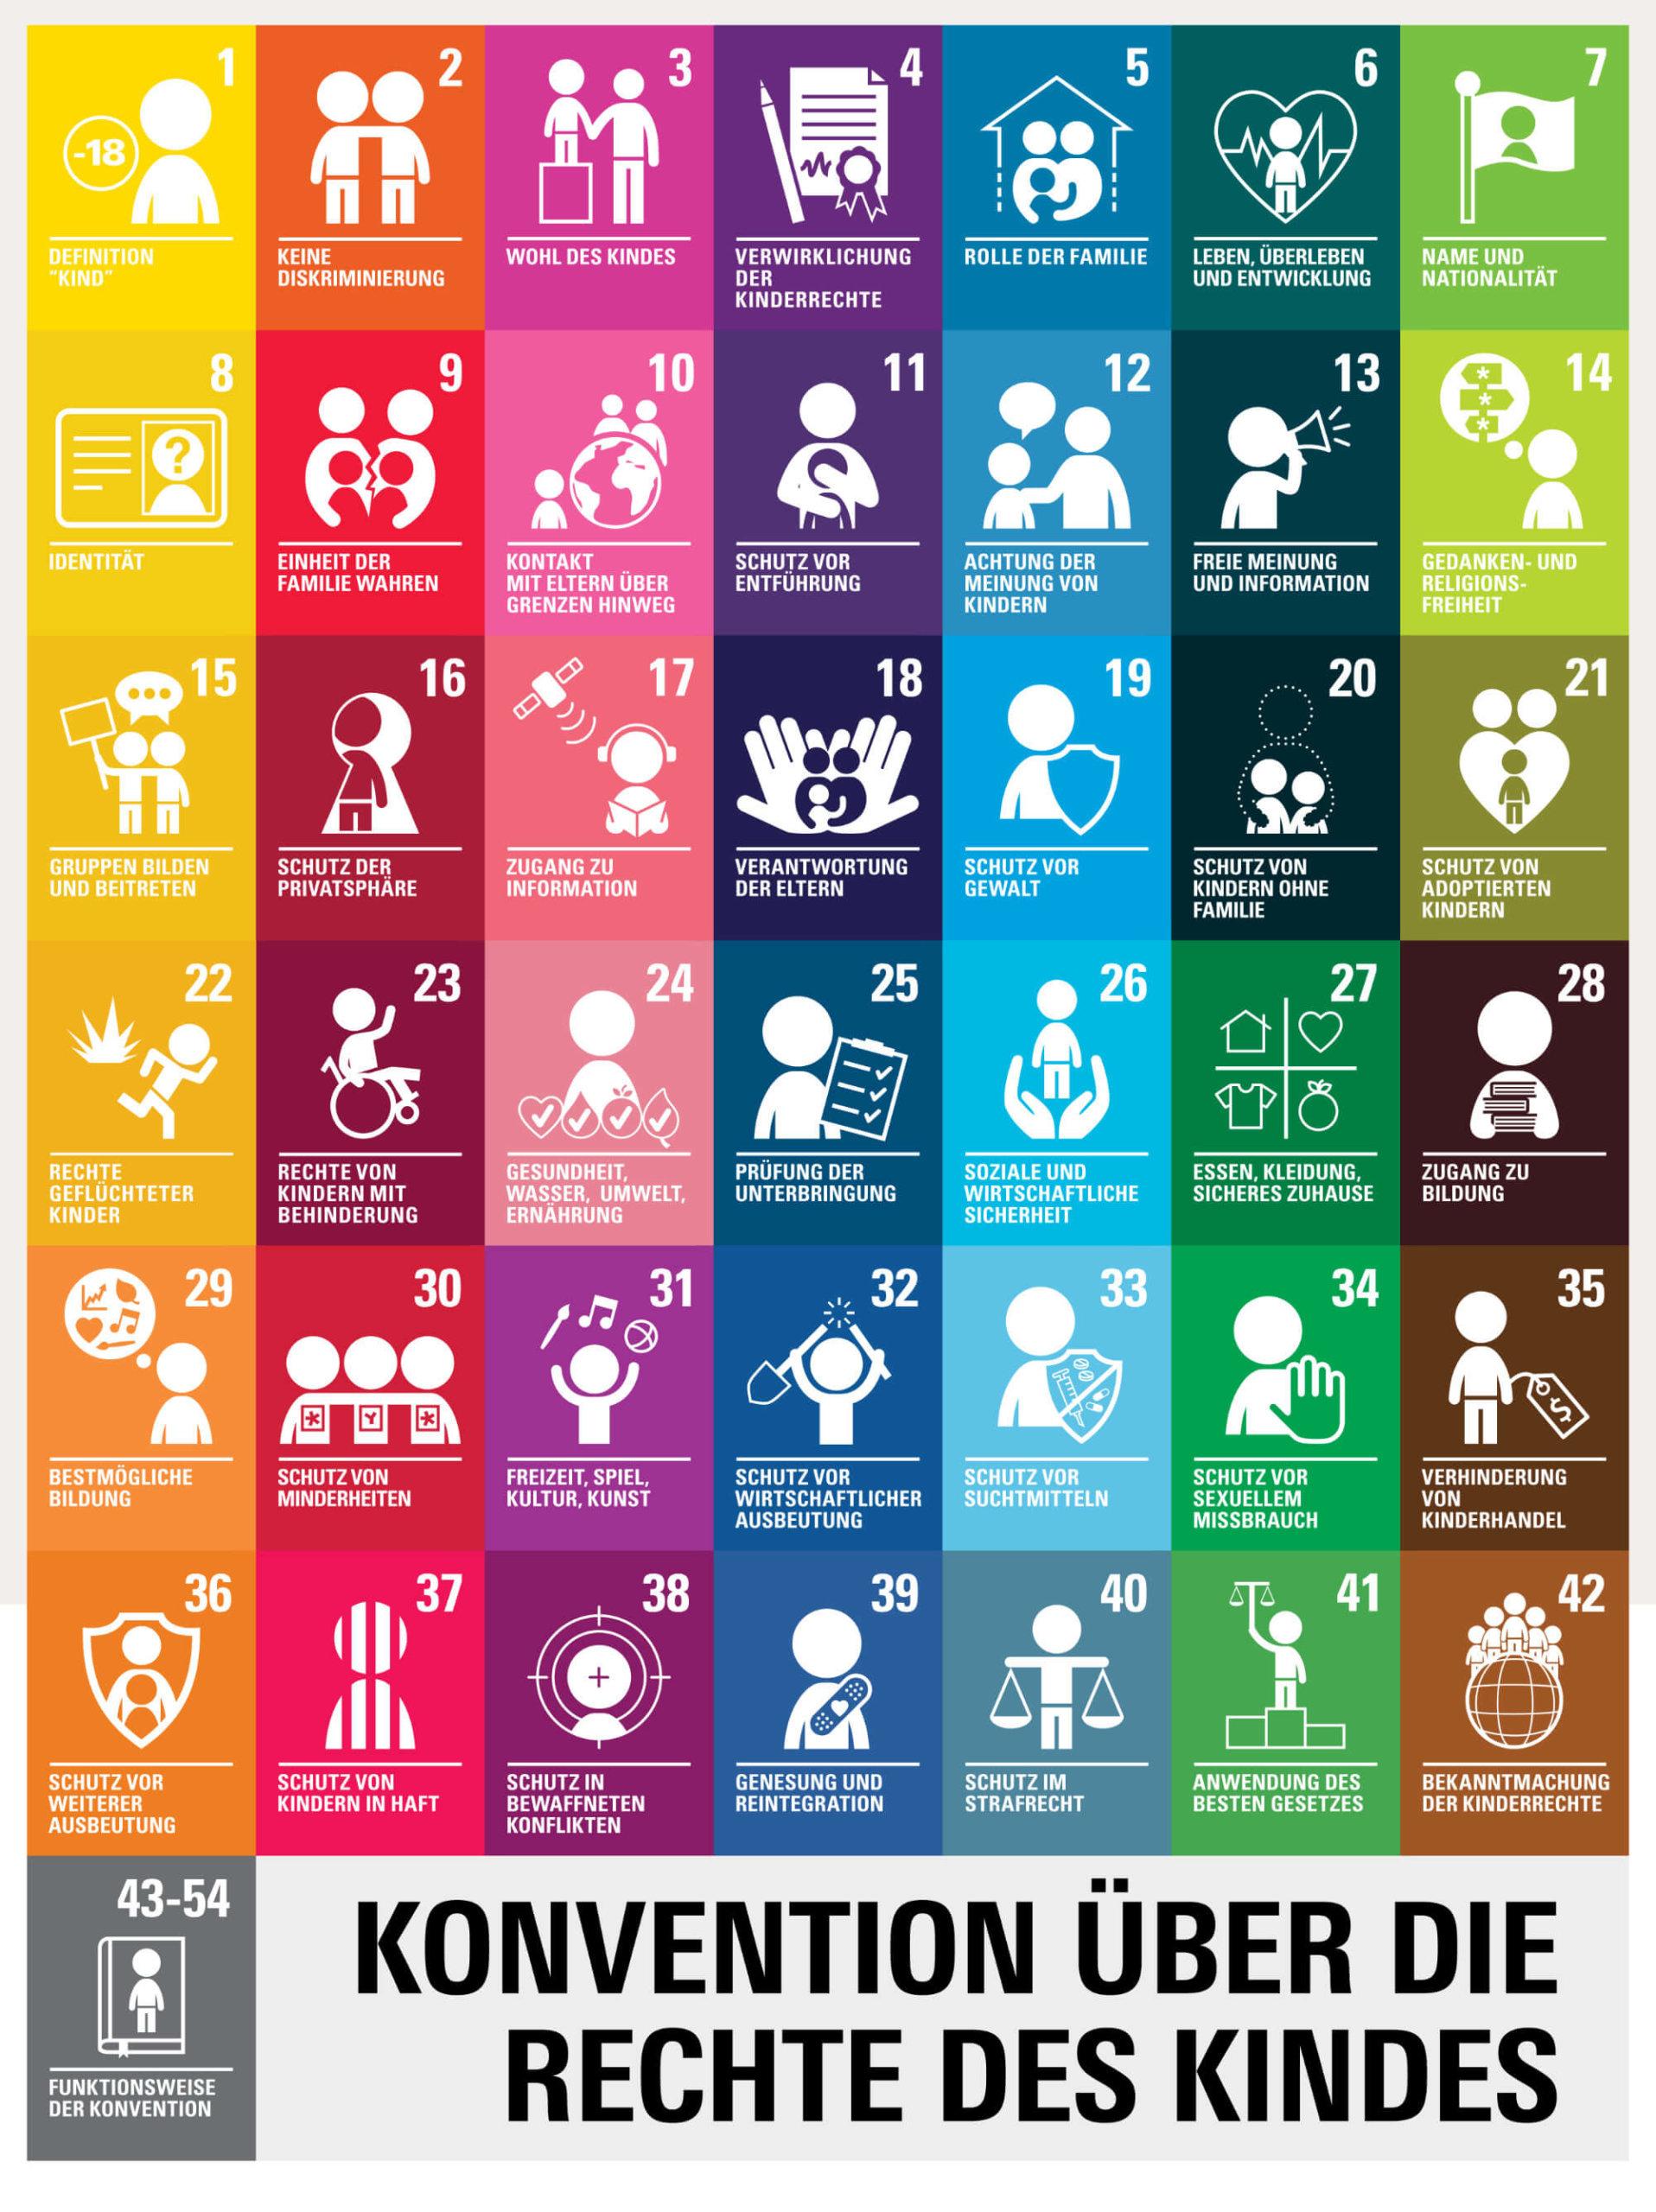 Plakat Kinderrechte UNICEF